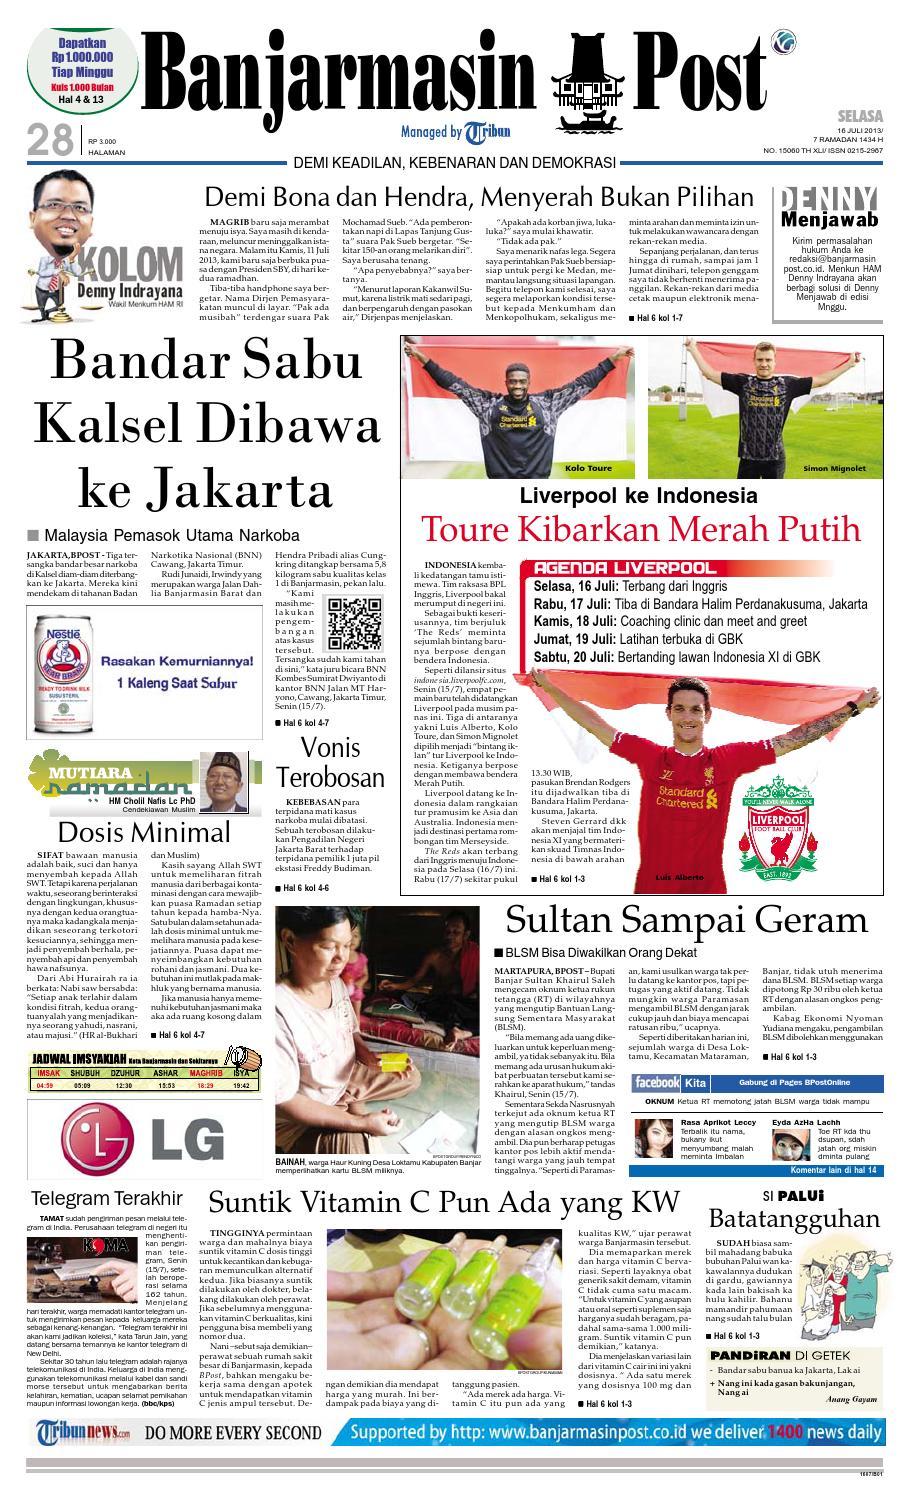 Banjarmasin Post Selasa 9 Juli 2013 By Issuu Bakpia Nurfatimah Siti Ramlah Pal 16